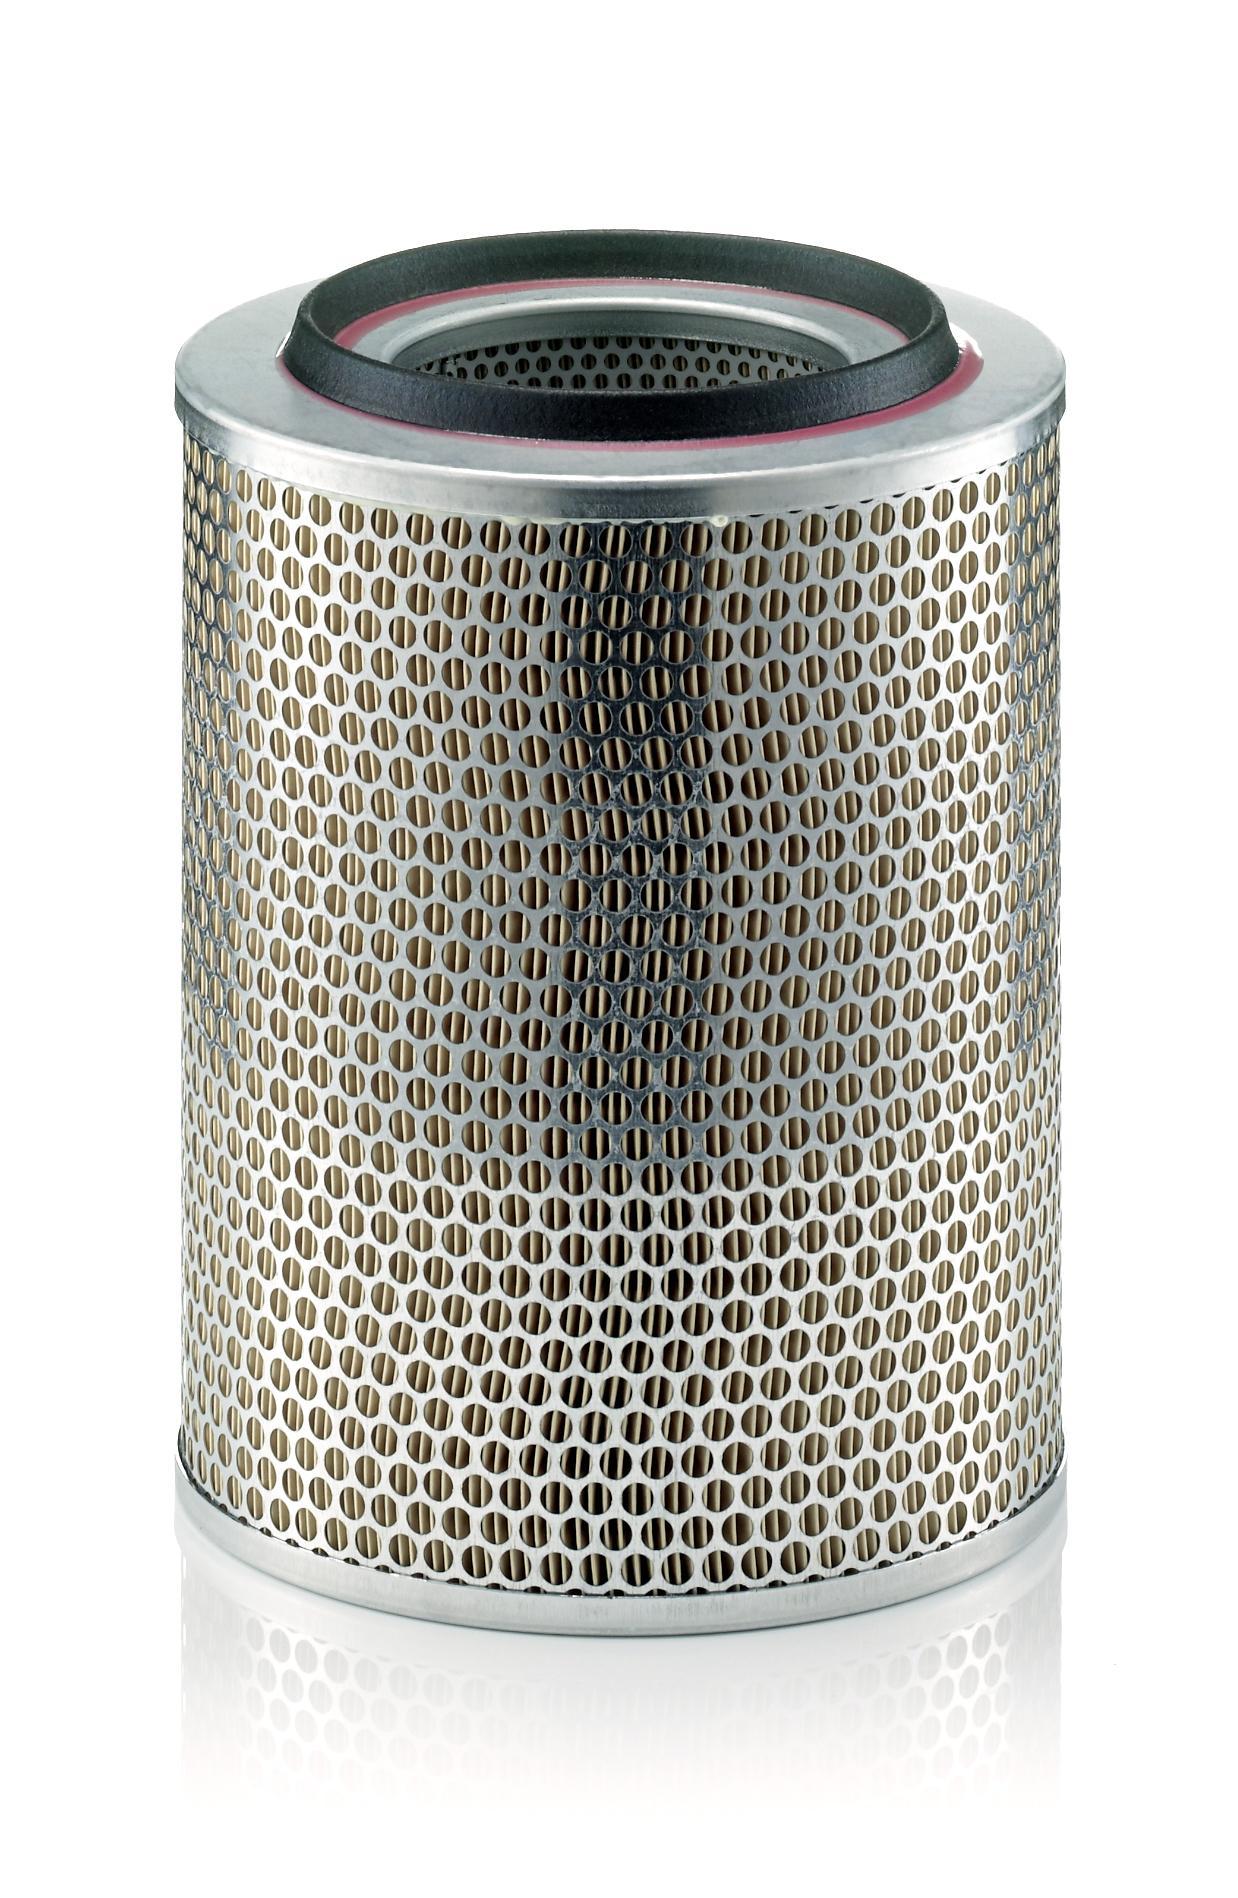 MANN-FILTER Air Filter for IVECO - item number: C 23 440/2